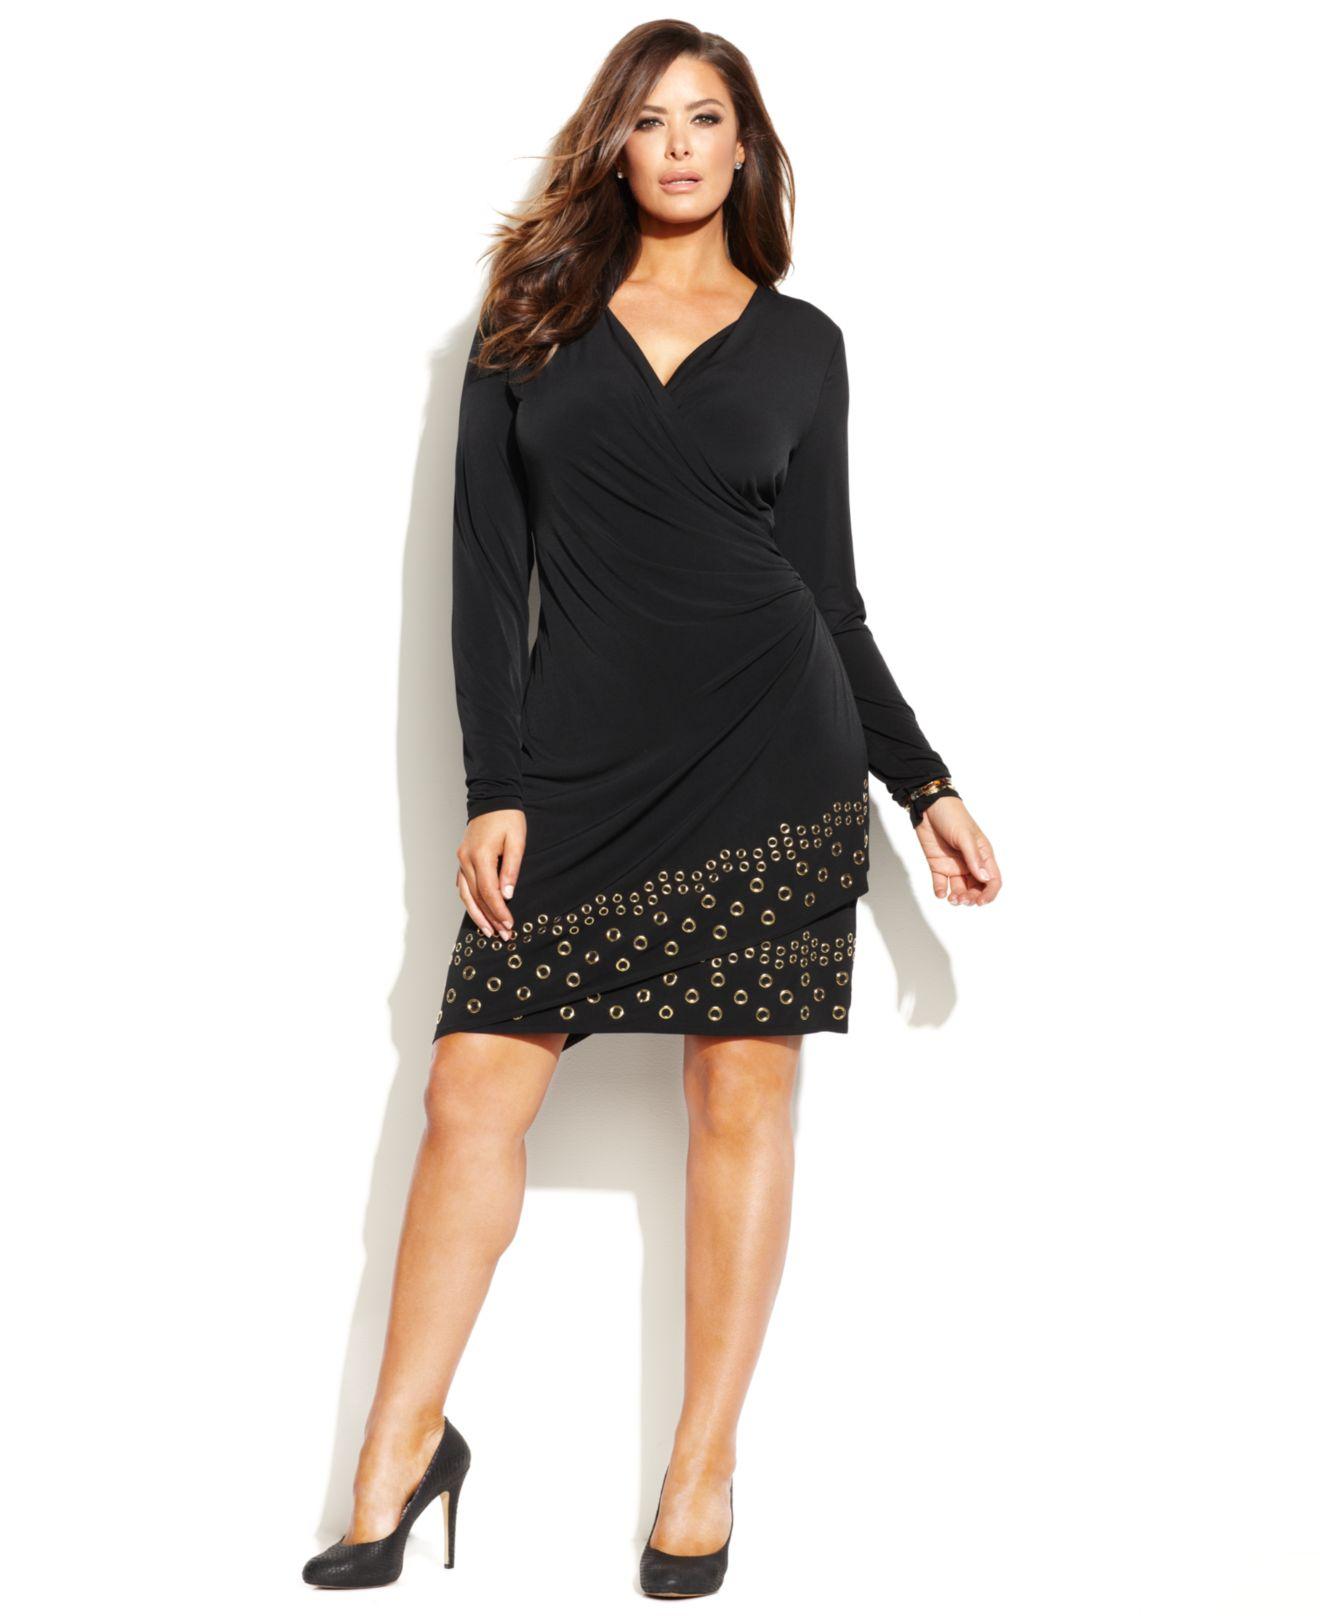 Black dress size 0 grommet